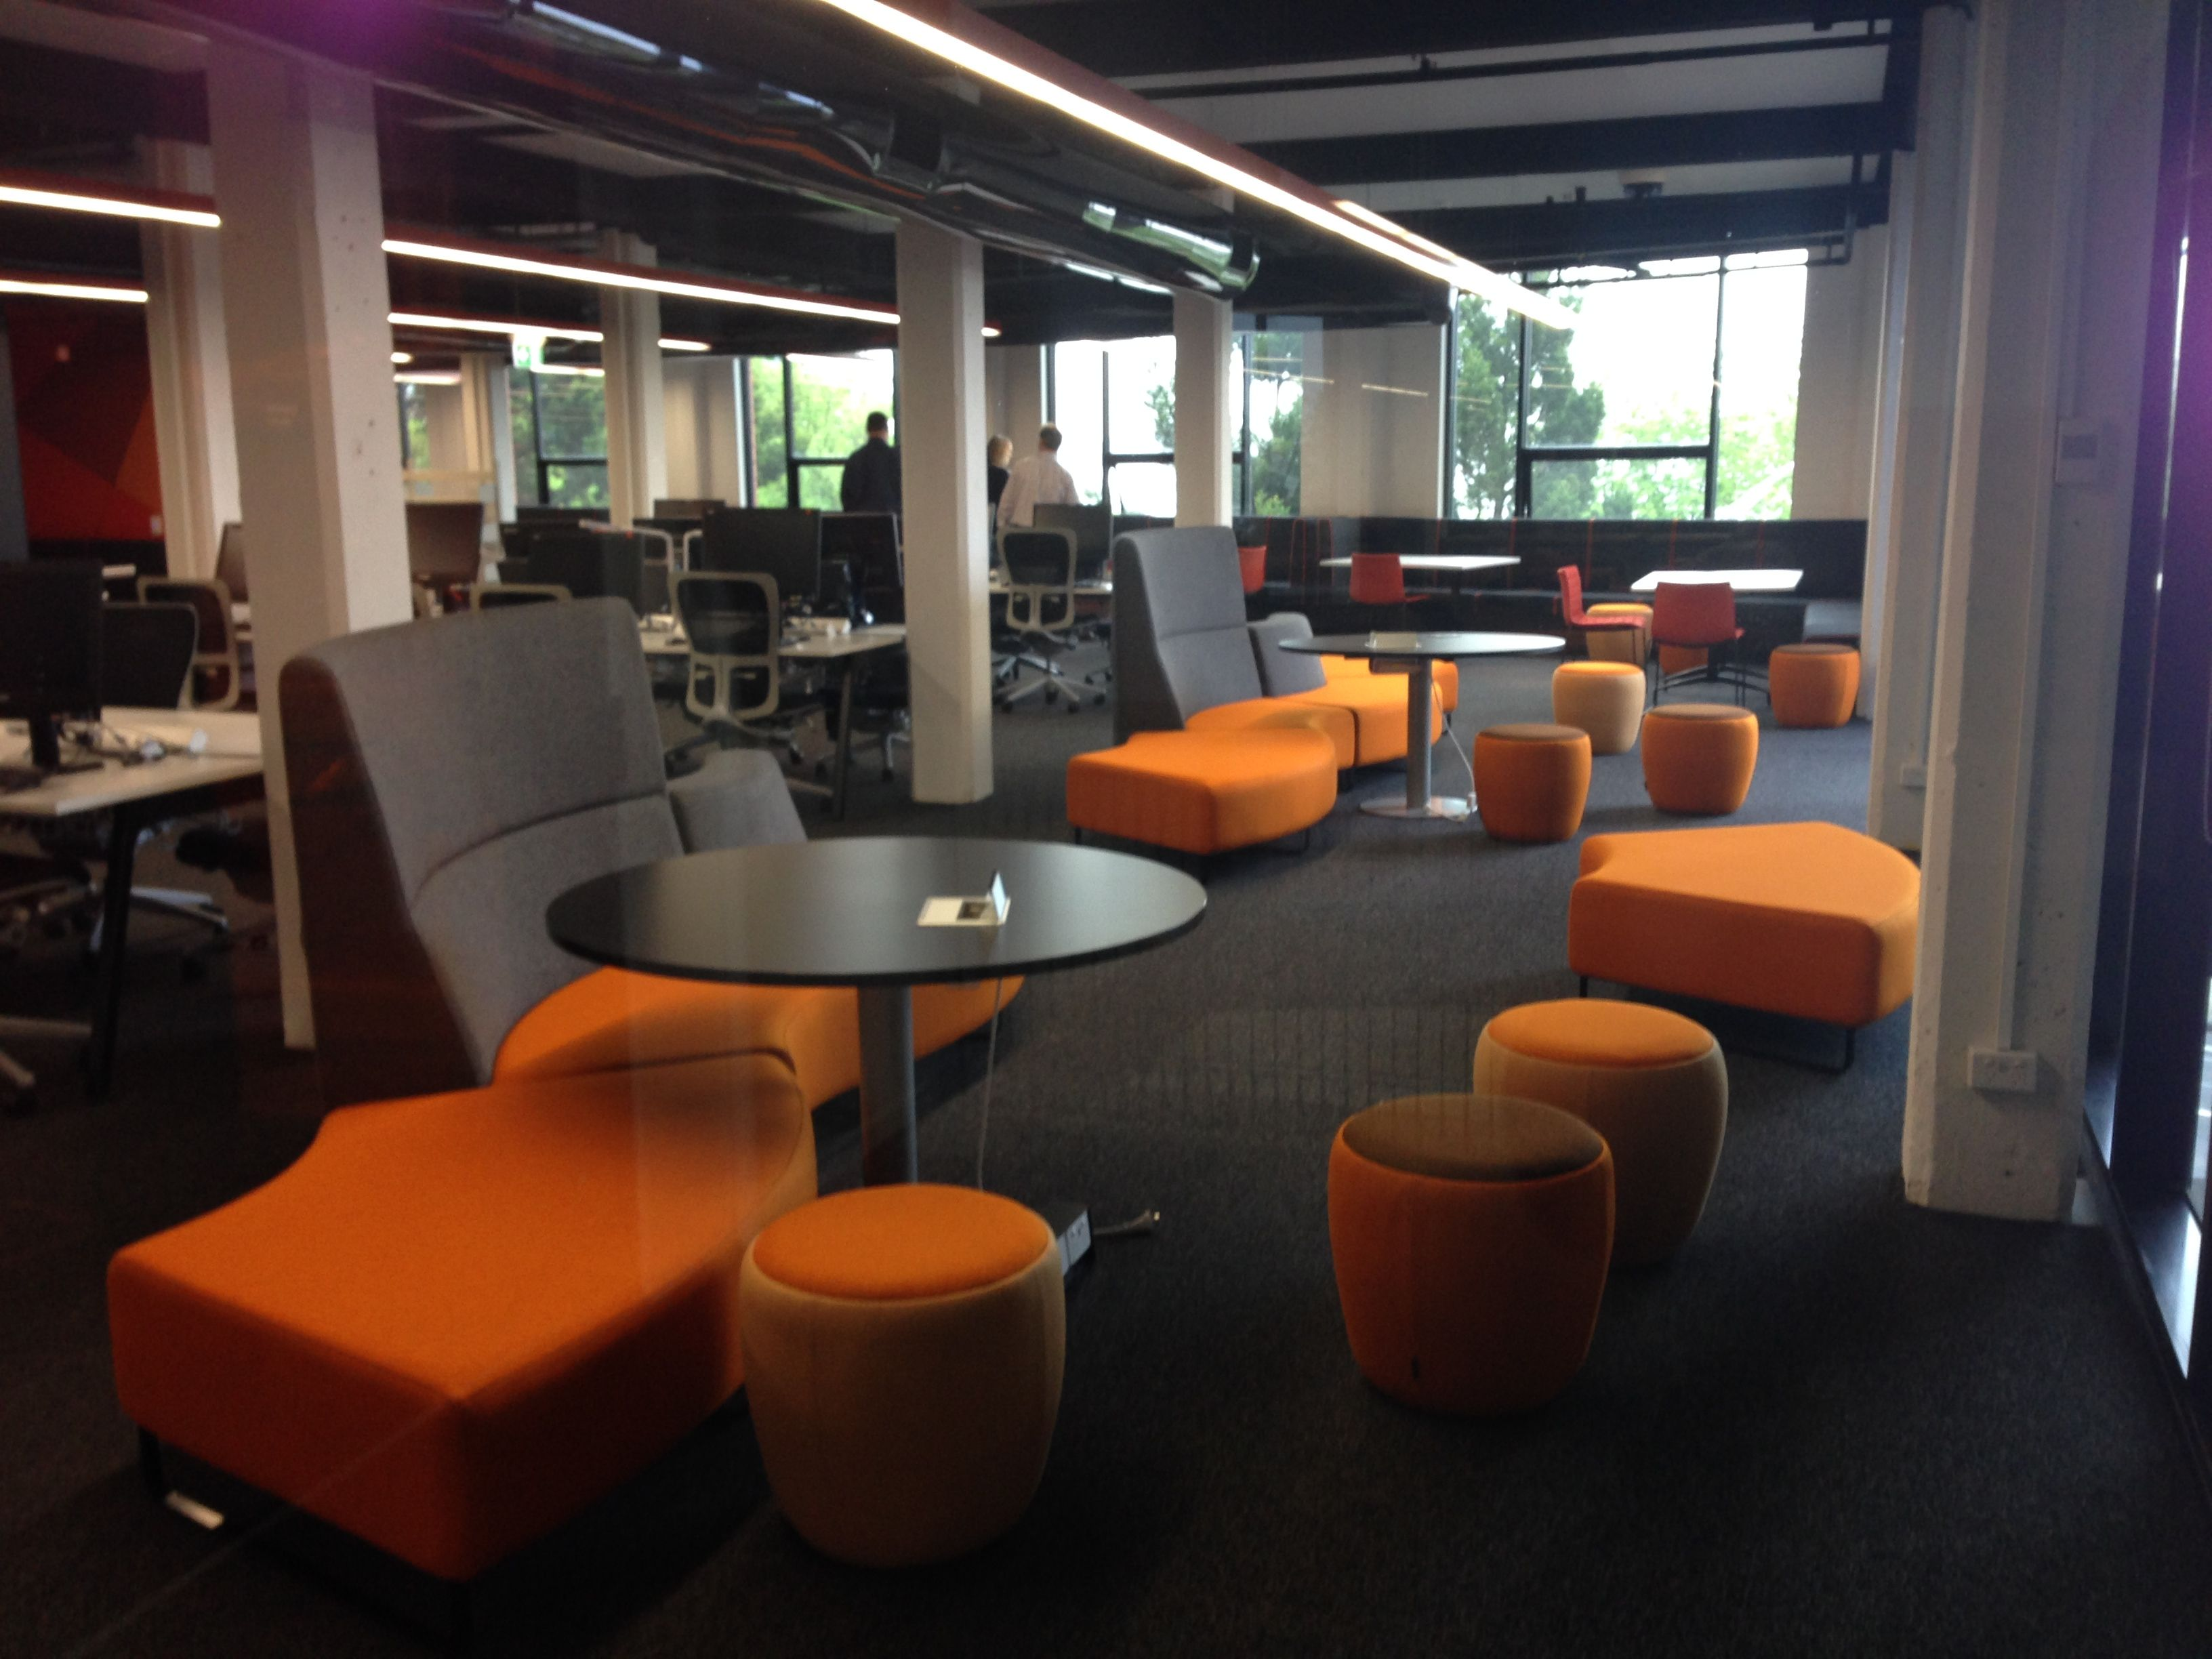 Student Lounge Design on Behance